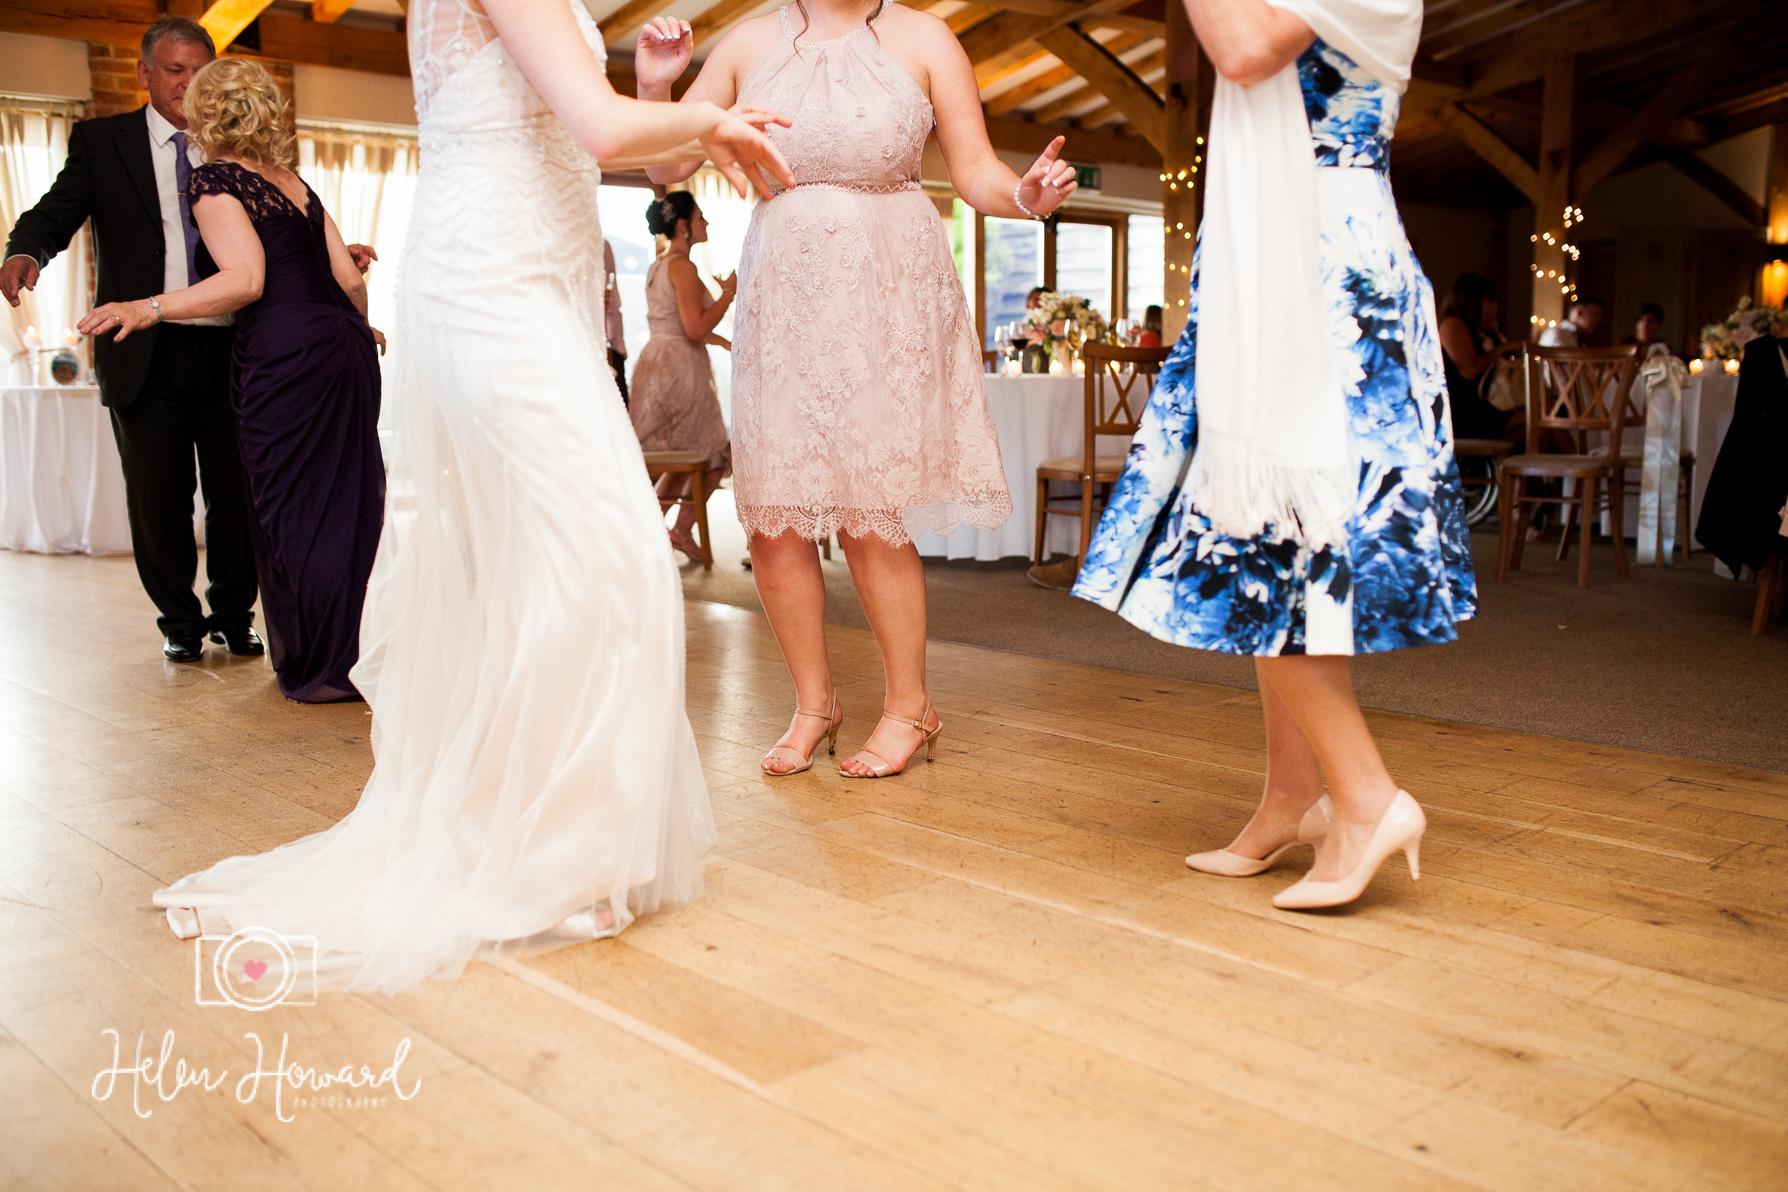 Helen Howard Photography Packington Moor Wedding-127.jpg